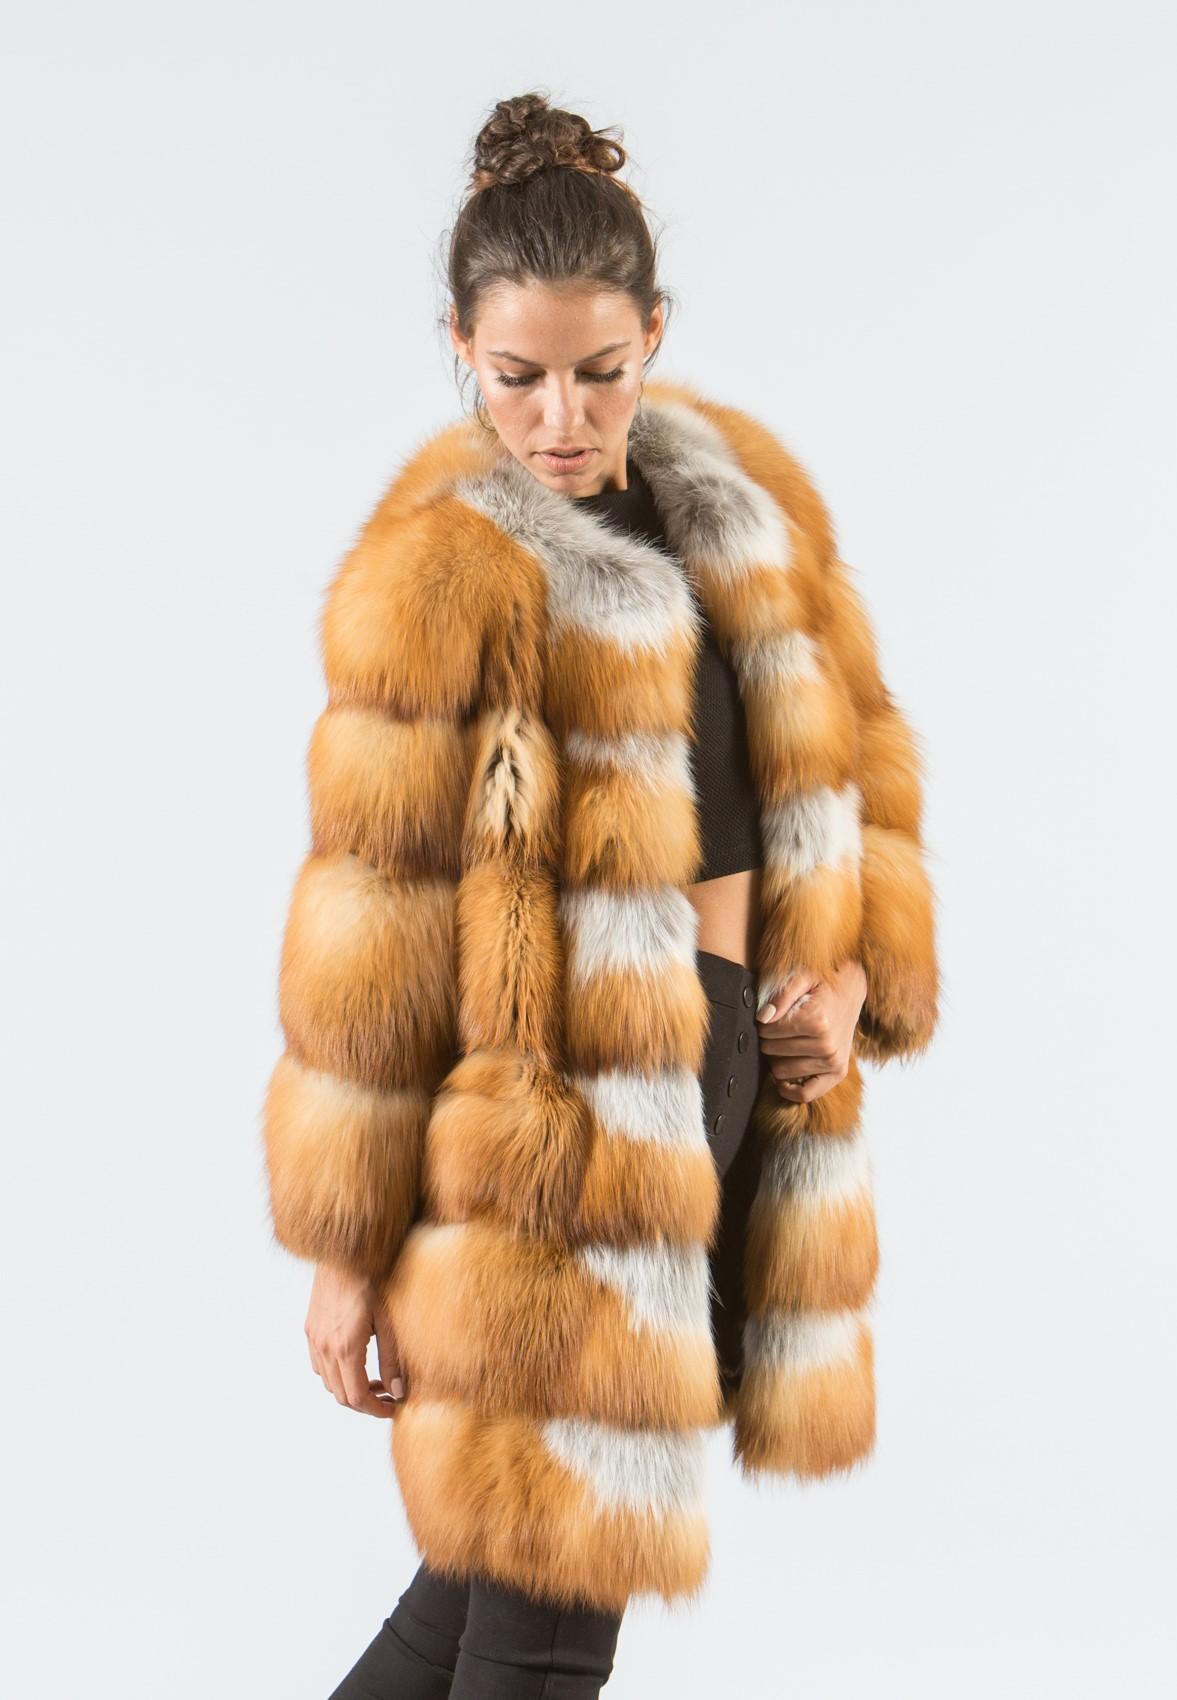 Canadian Red Fox Fur Jacket - 100% Real Fur Coats